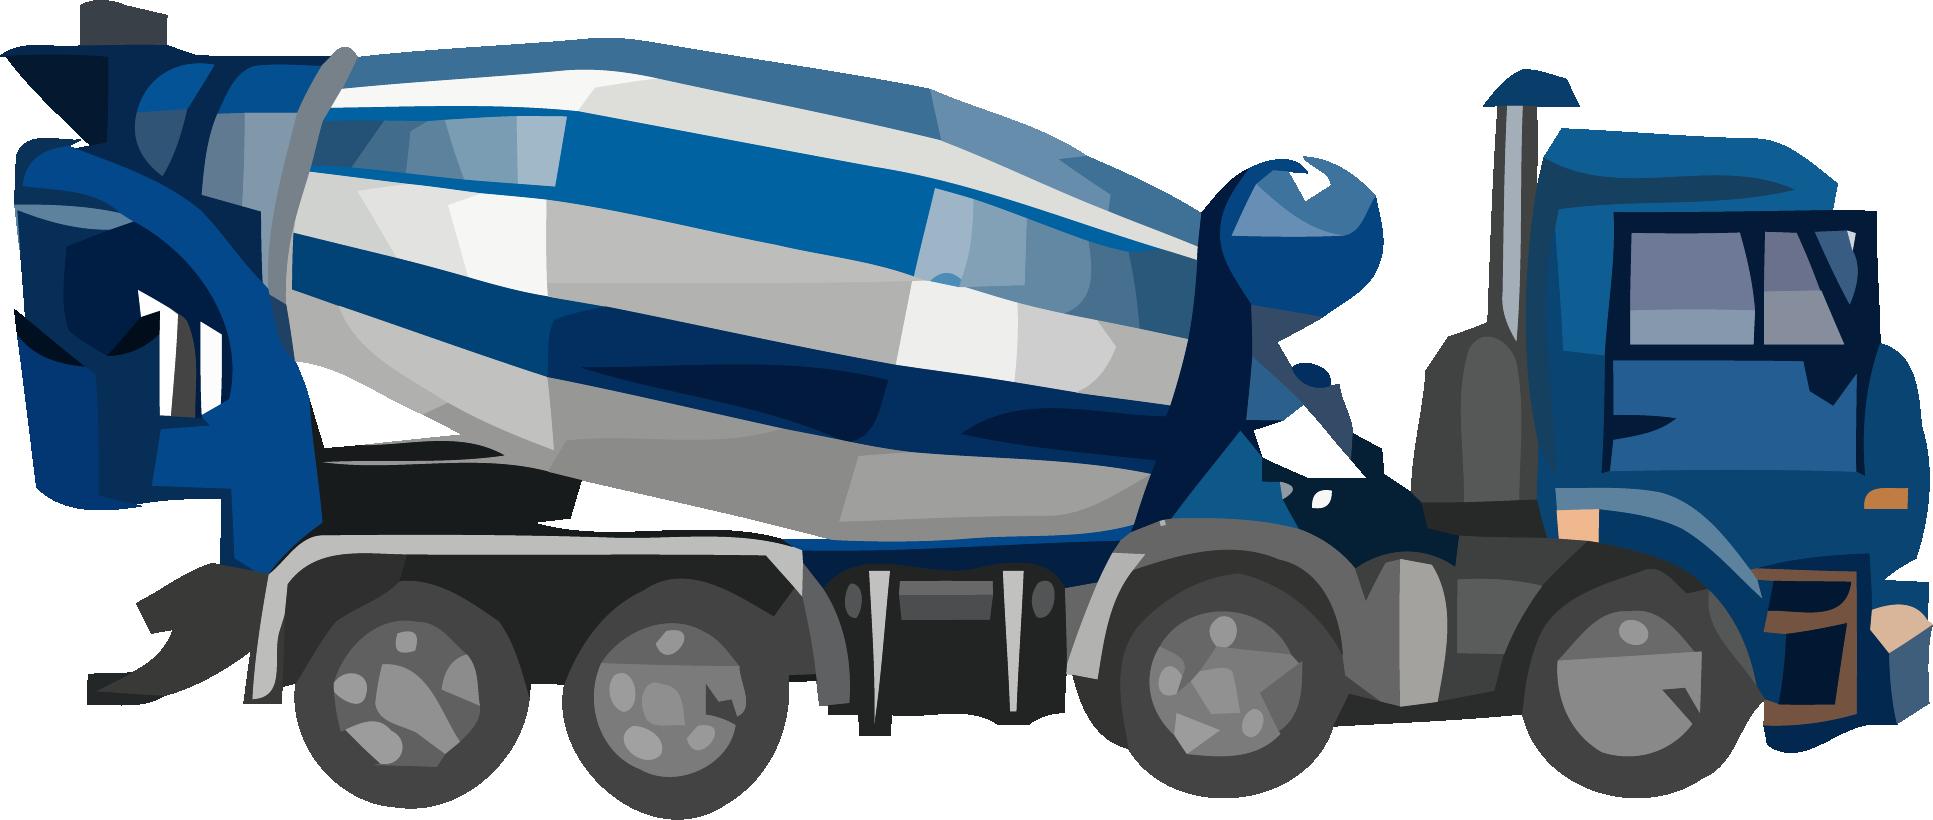 Cement Mixers Motor vehicle Car Truck Concrete.